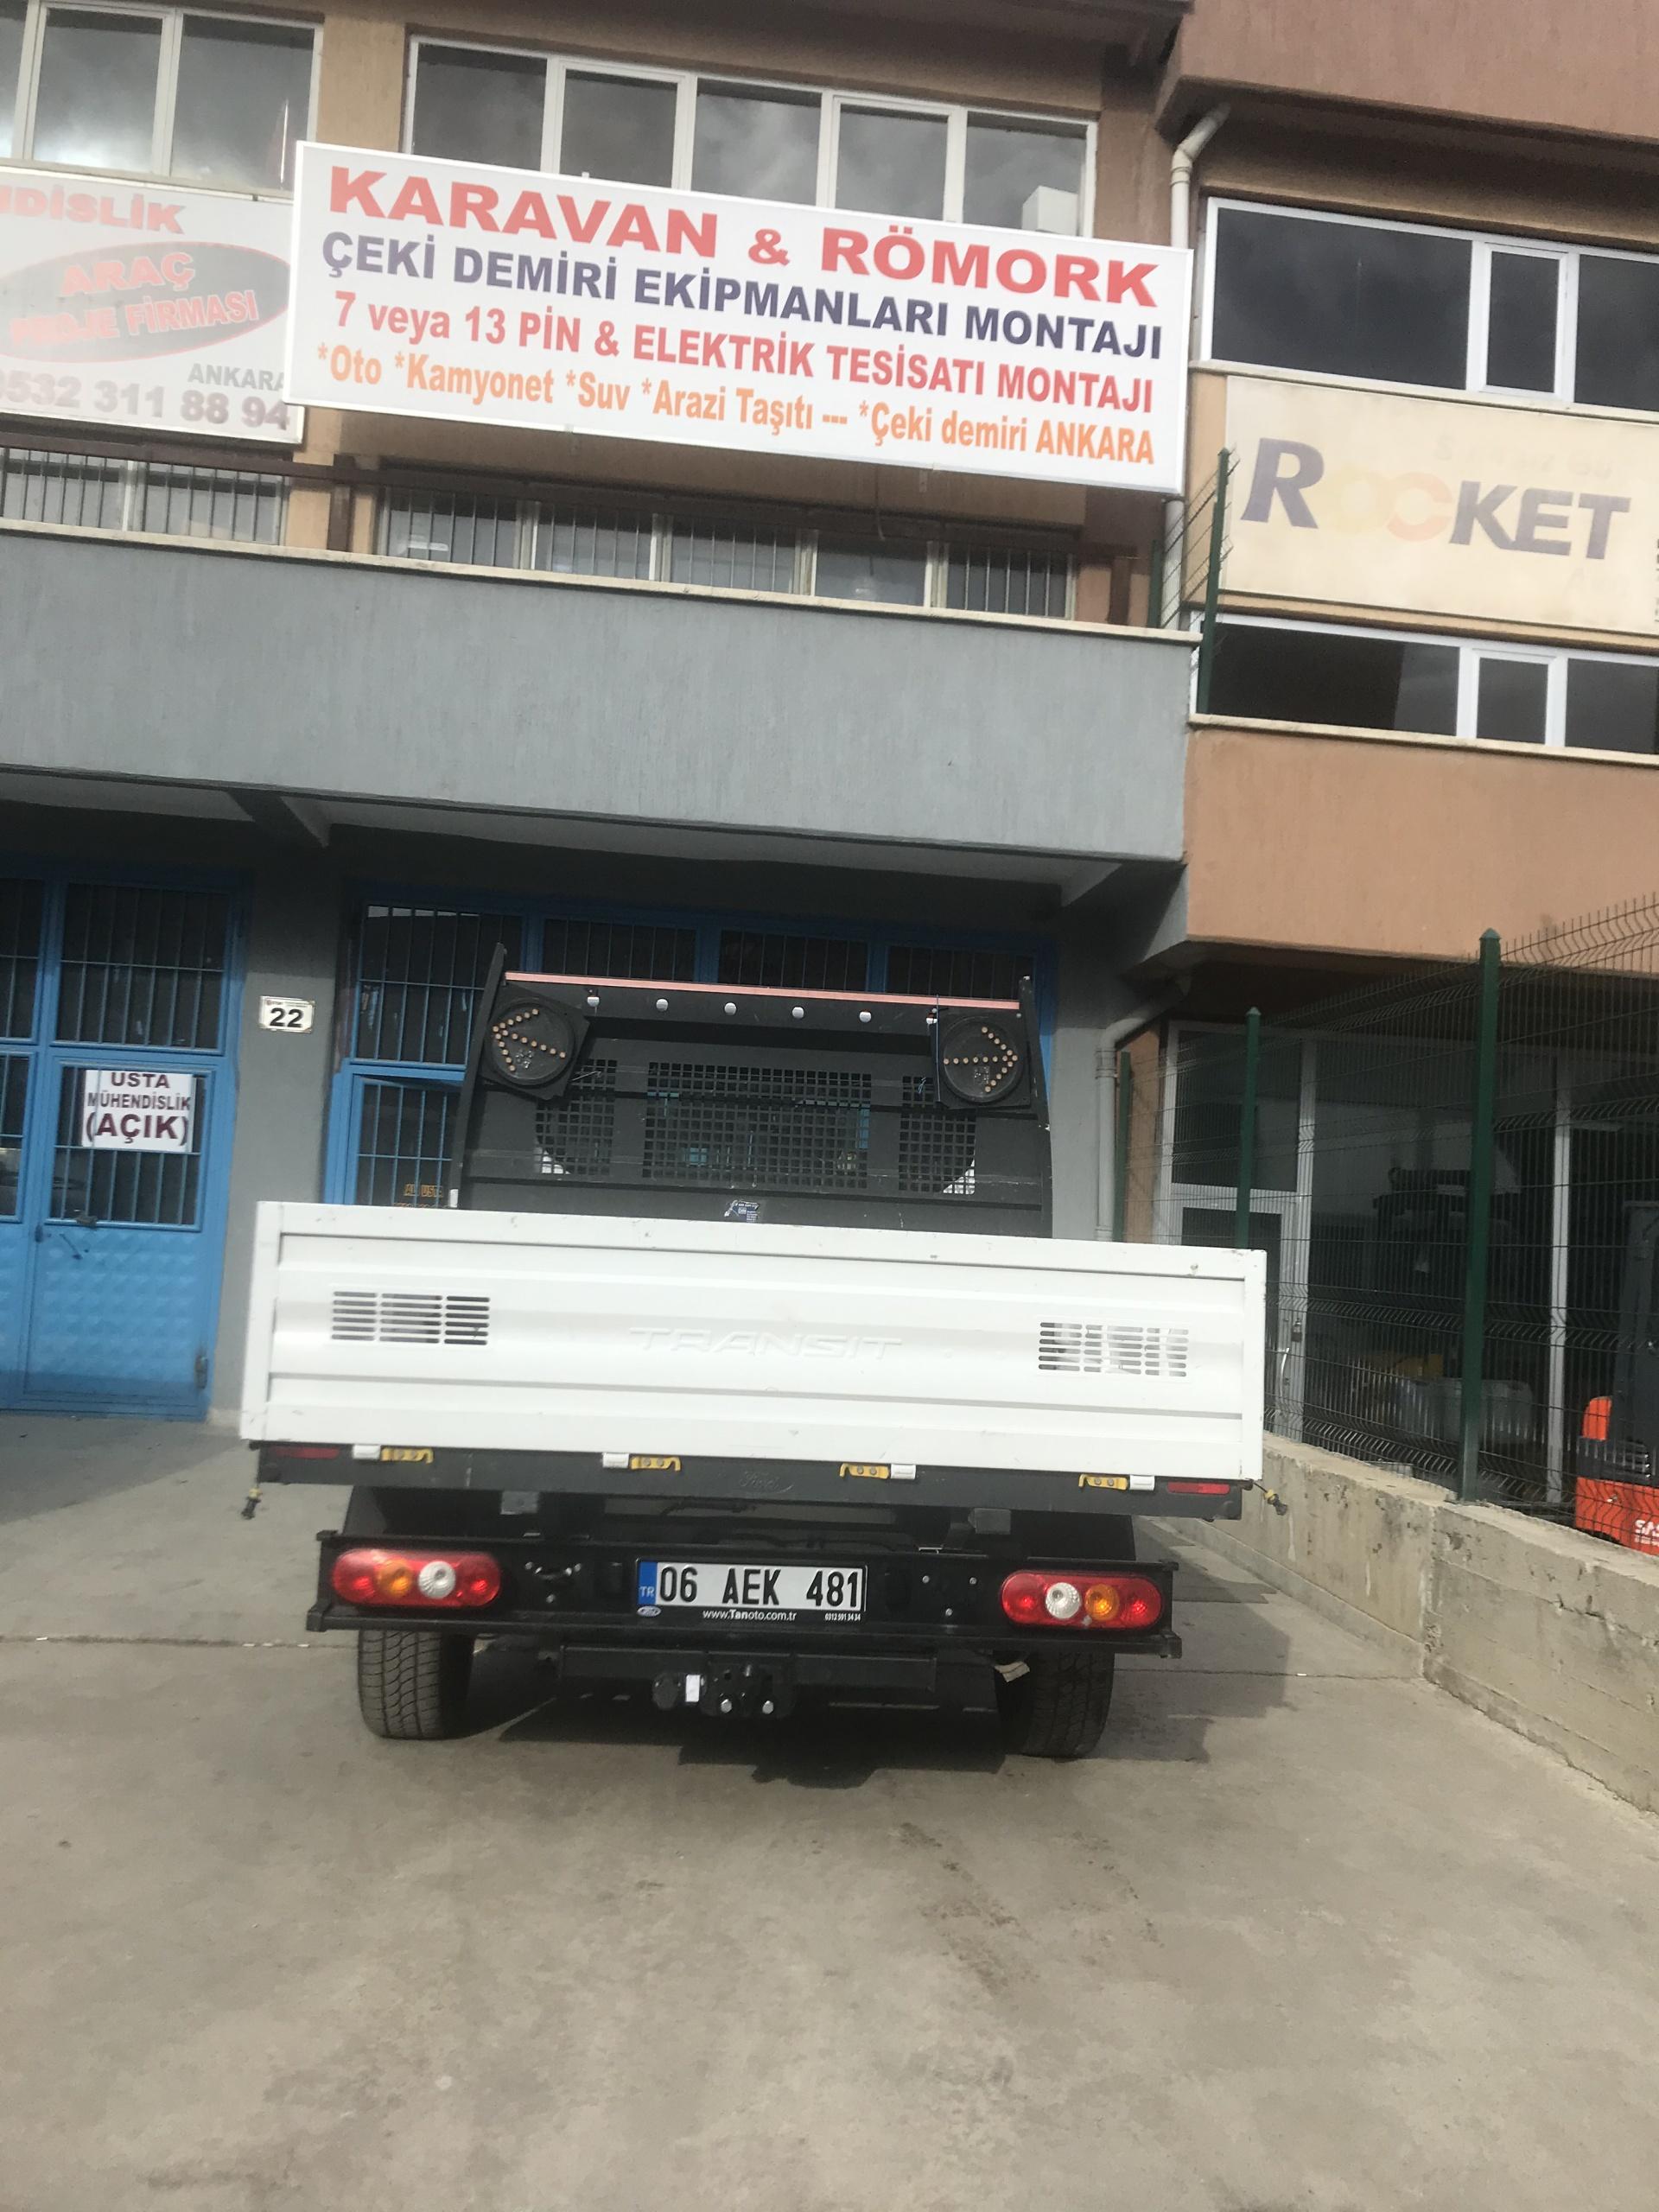 USTA MÜHENDİSLİK OTO DİZAYN ANKARA 043